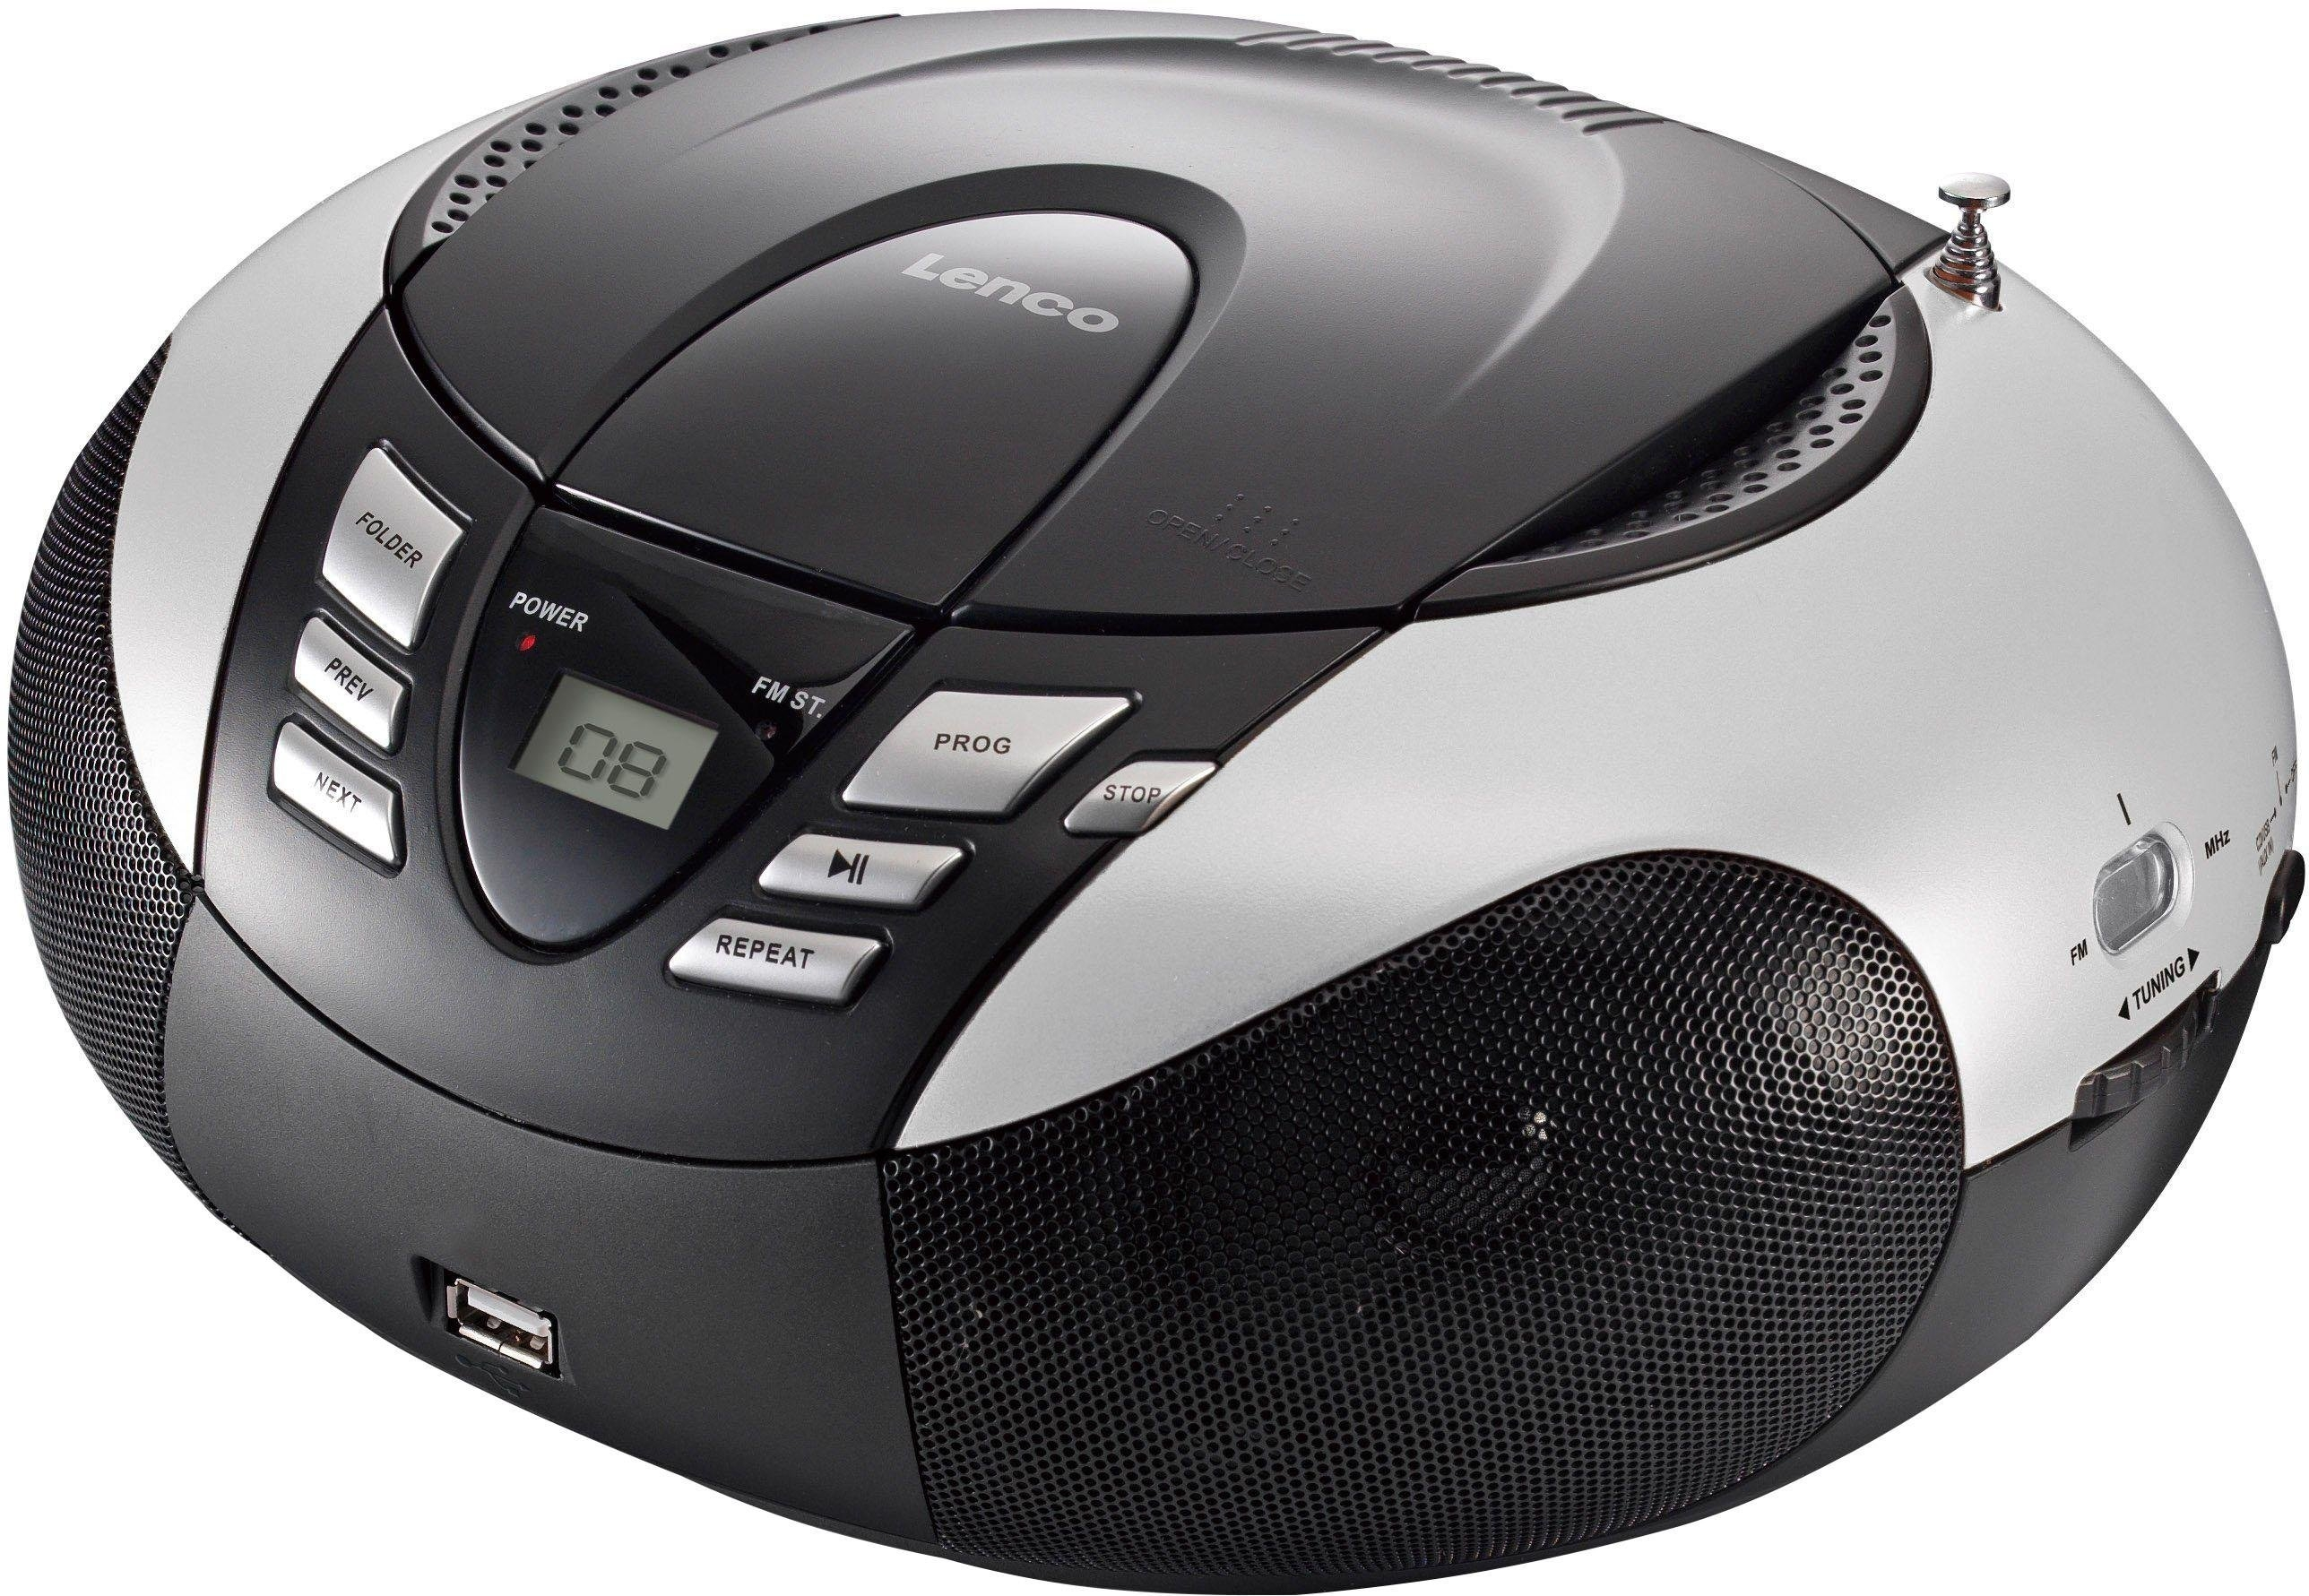 Lenco »SCD-37 Portables Radio mit CD Player/USB« FM-radio bestellen: 30 dagen bedenktijd